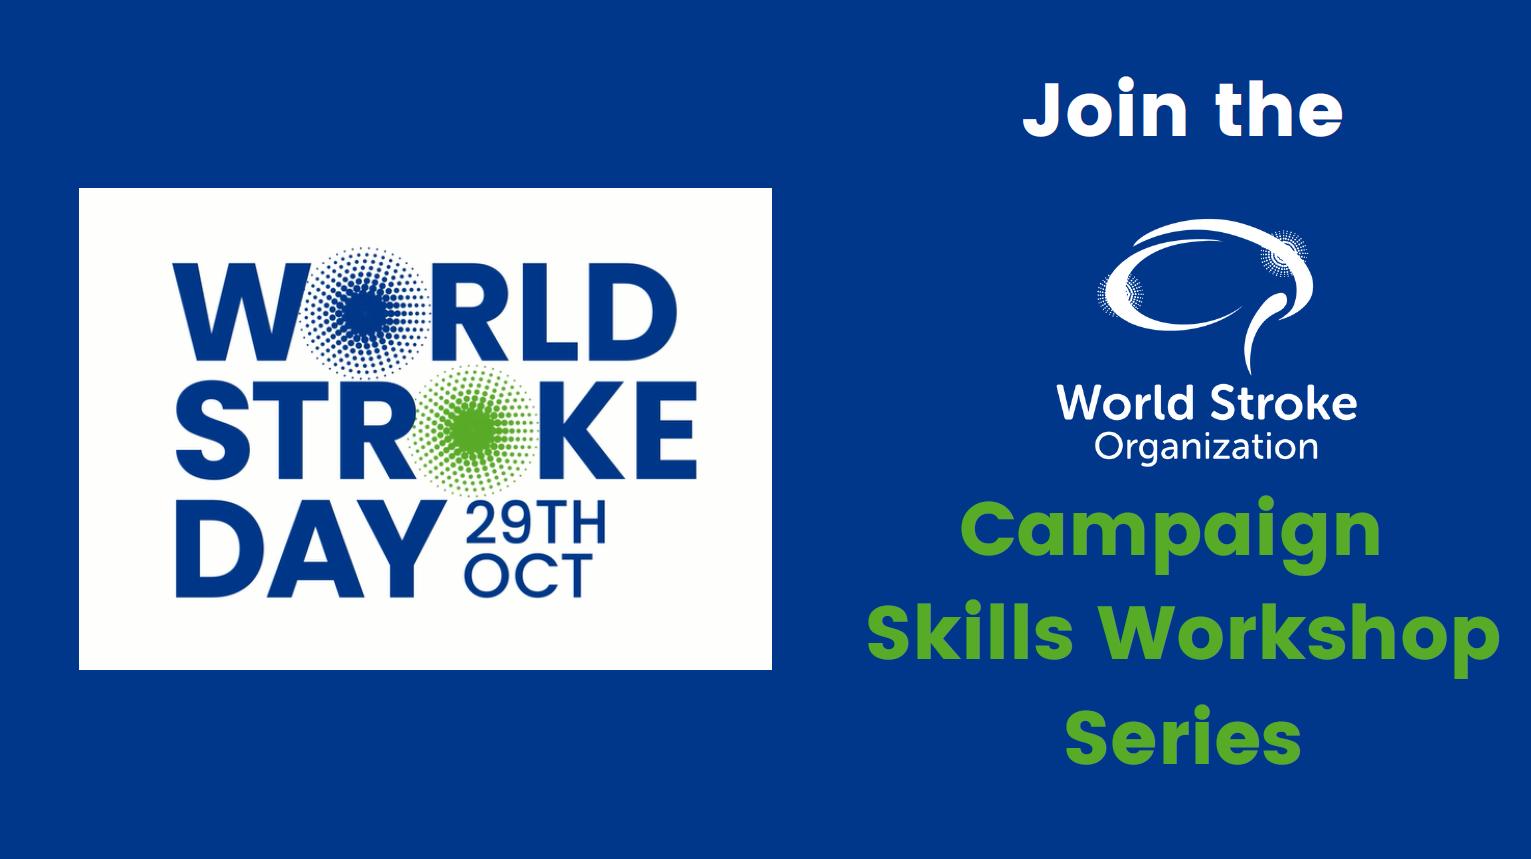 World Stroke Organisation free campaign skills workshops